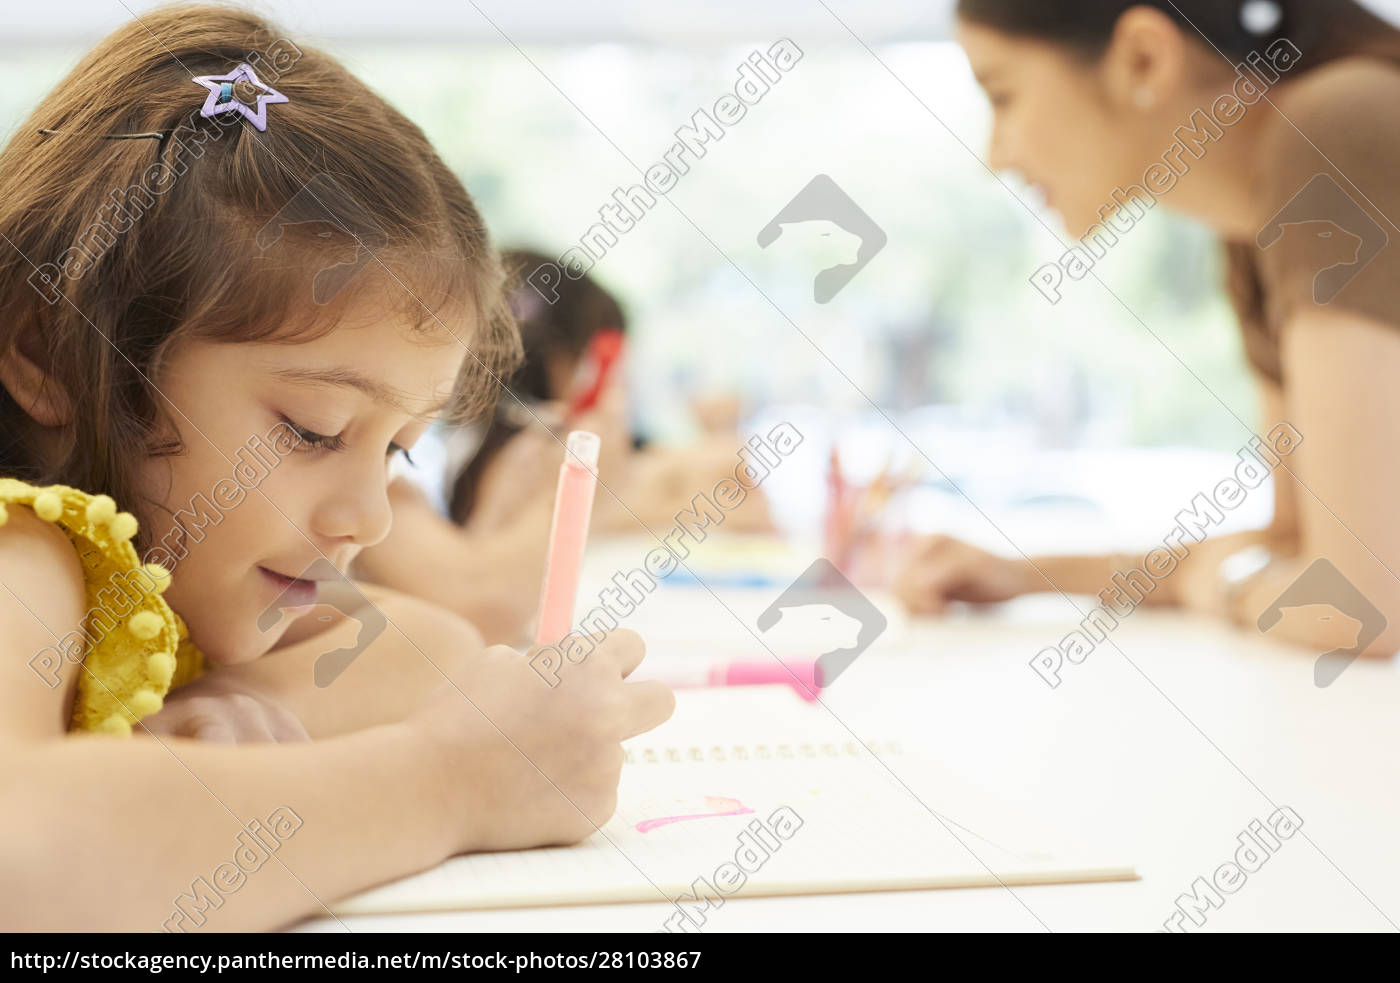 schoolchild, school, life - 28103867